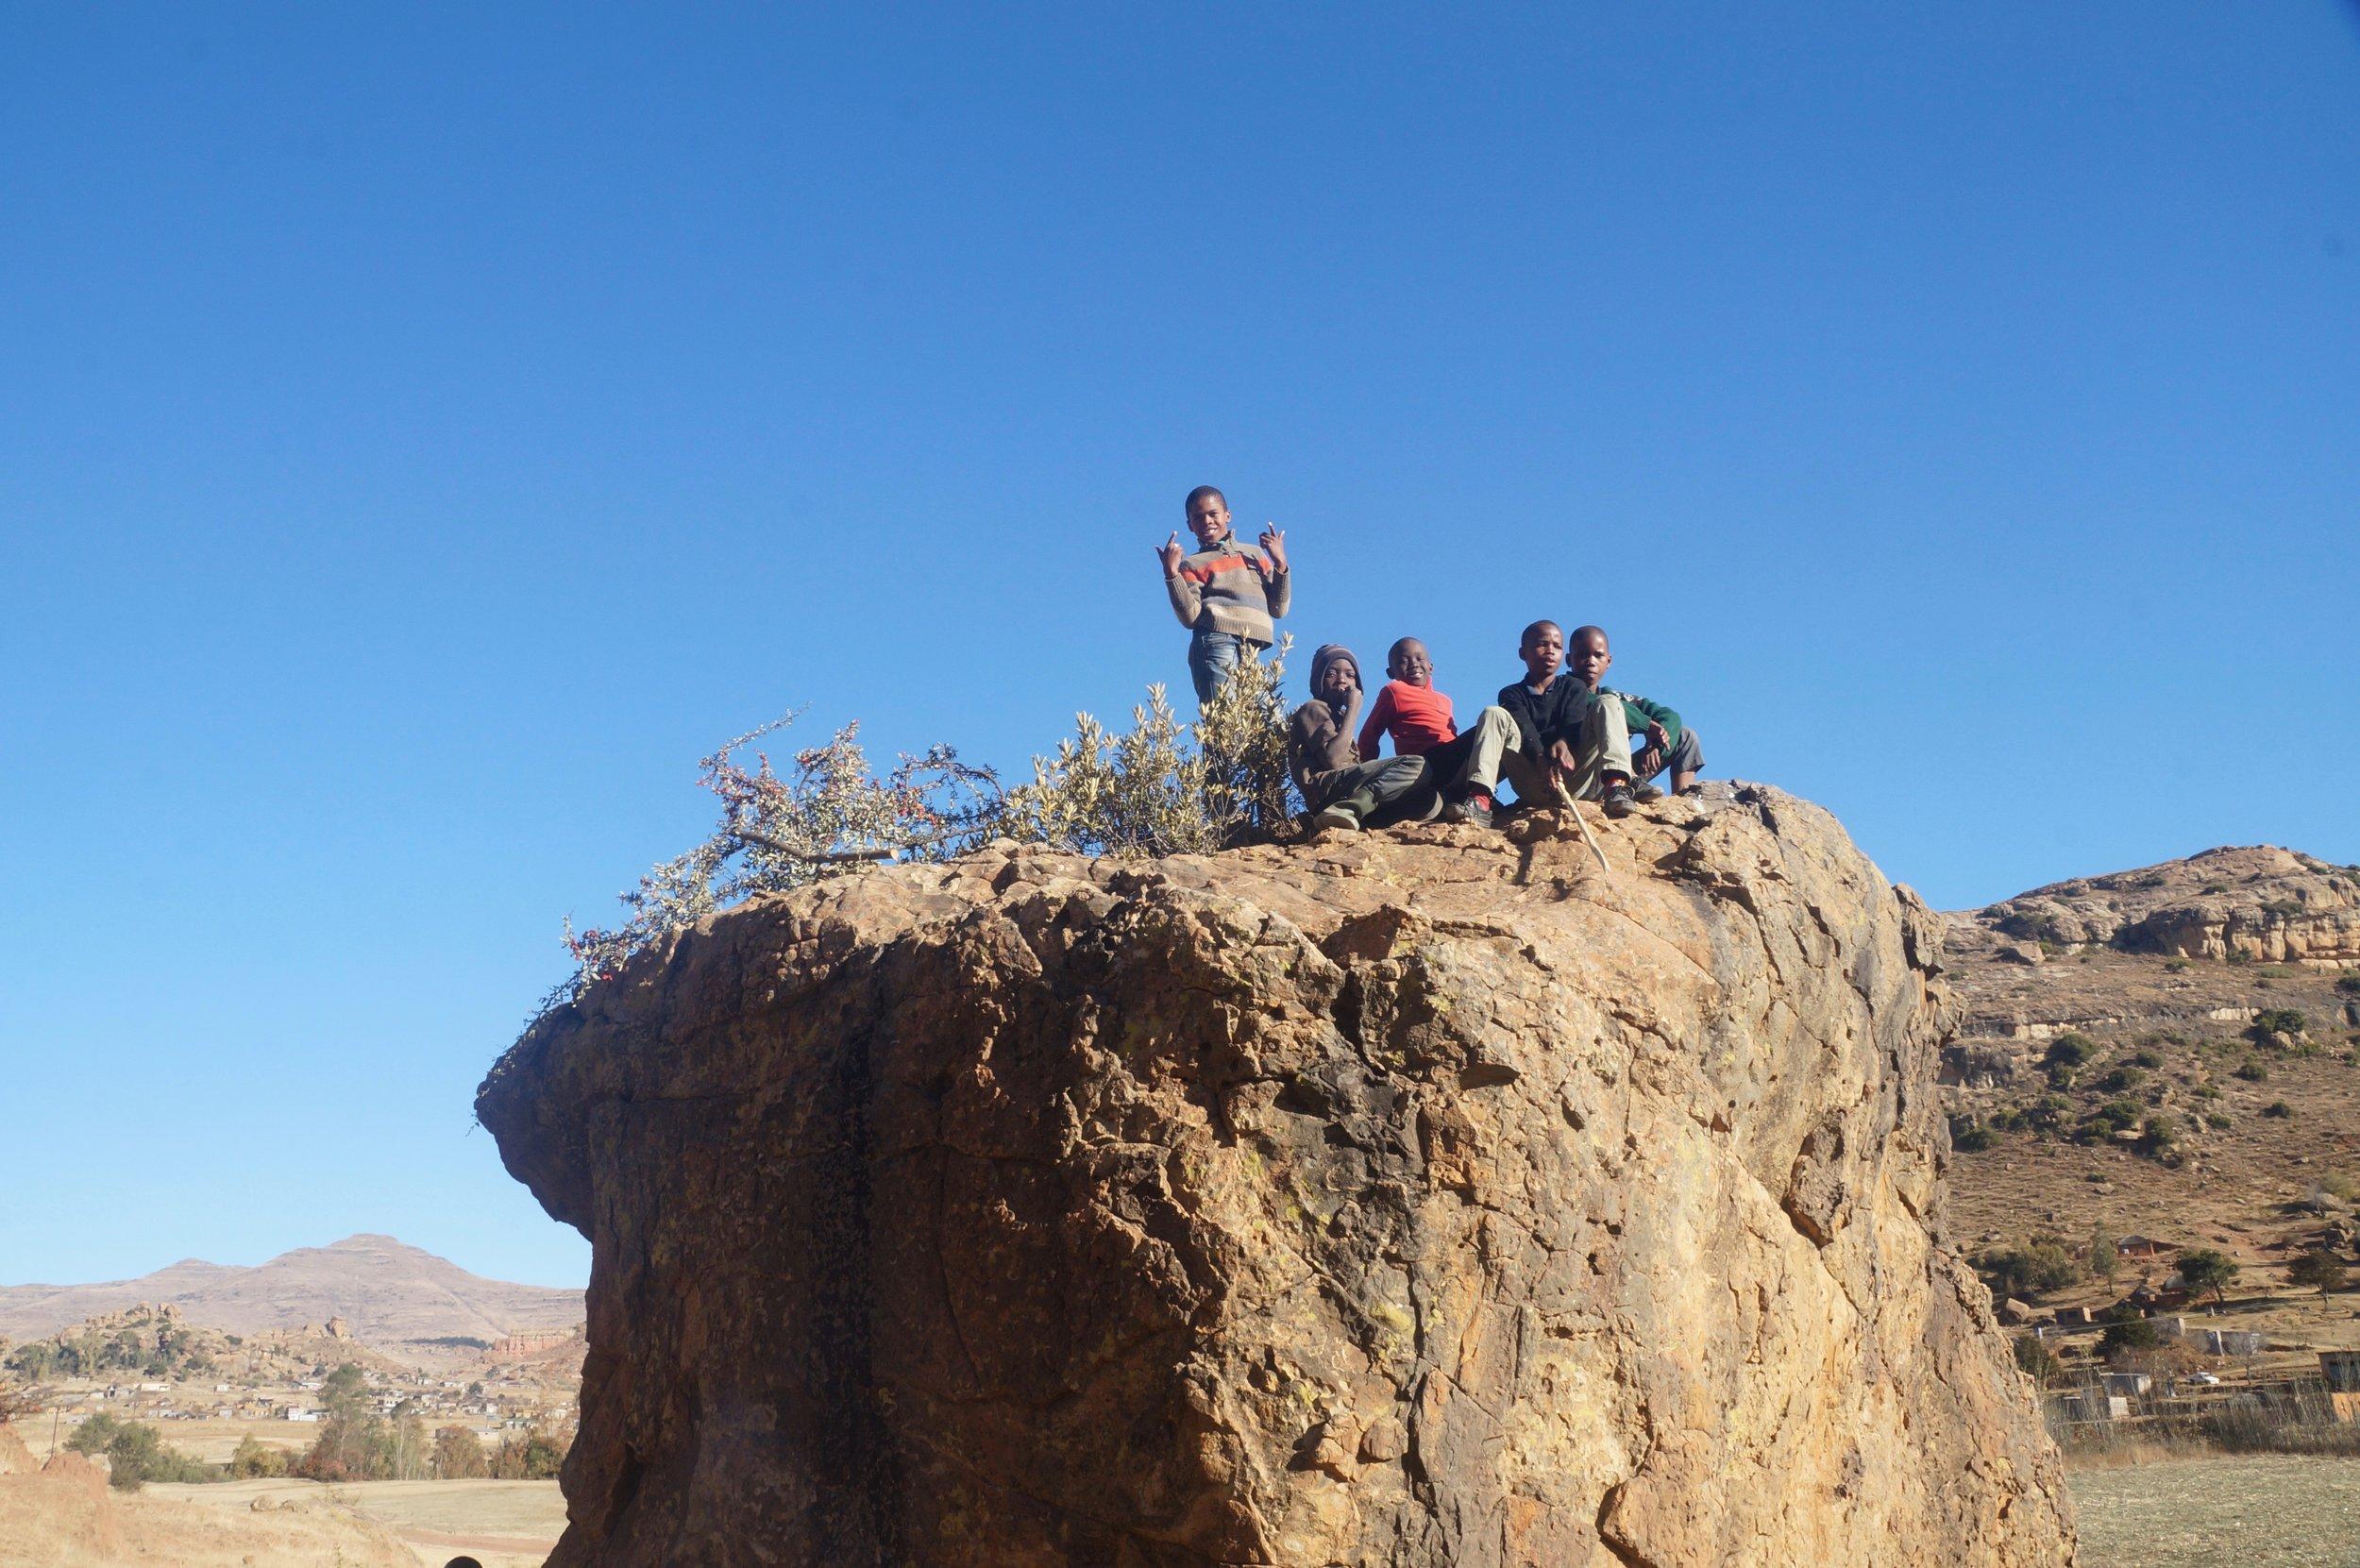 * A group of Basotho boys outside Butha Buthe joining the climbing scene.